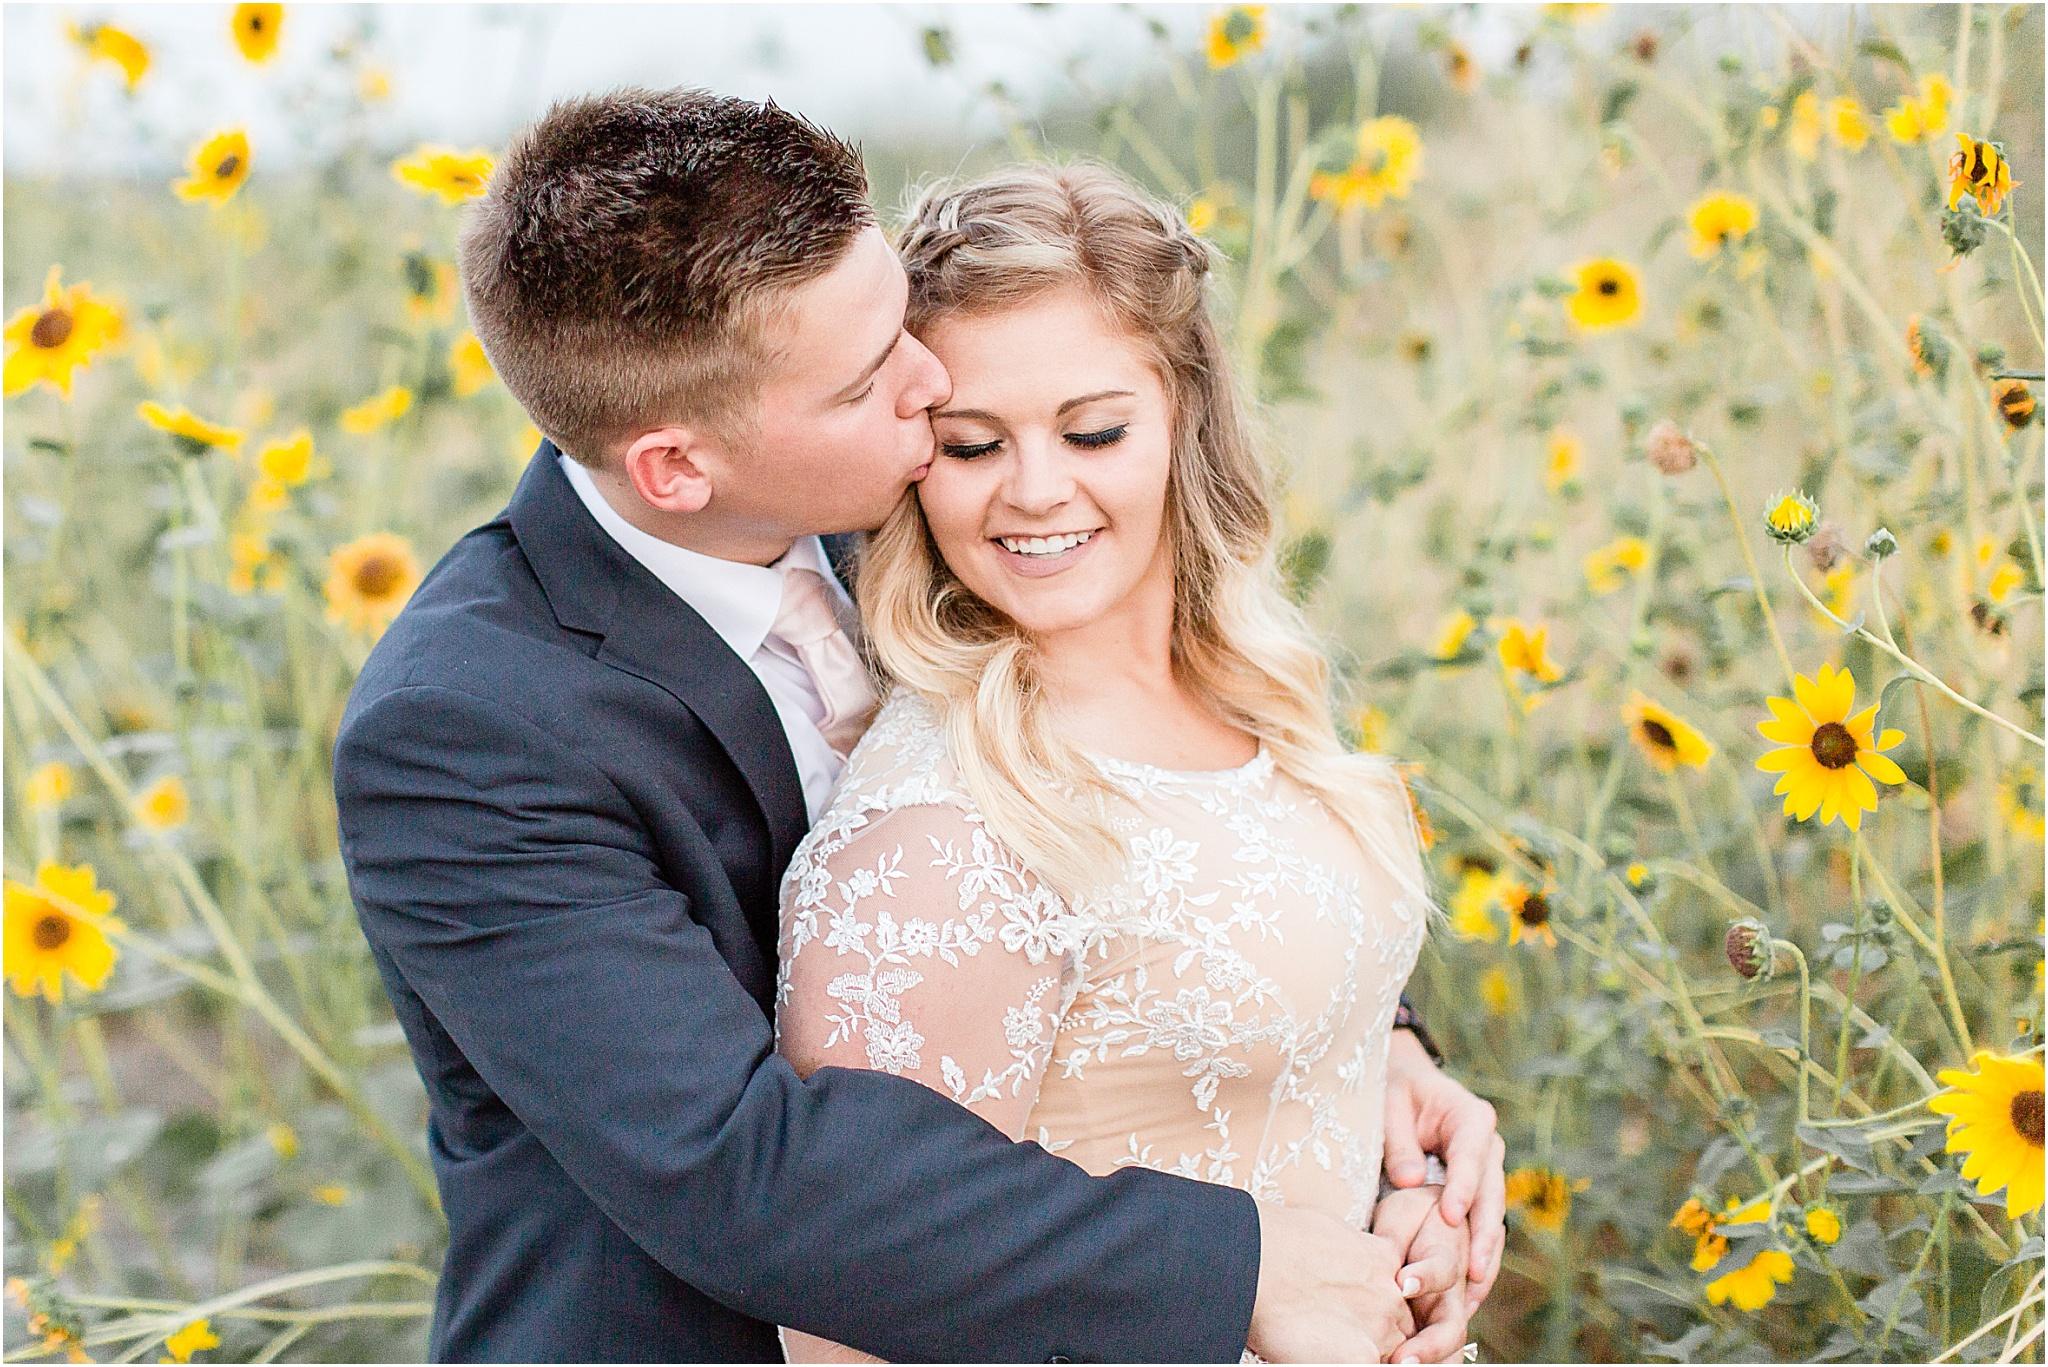 Wedding Photography_Meridian Idaho Temple_Boise Idaho_Nampa Idaho_Leah Southwick Photography_0030.jpg